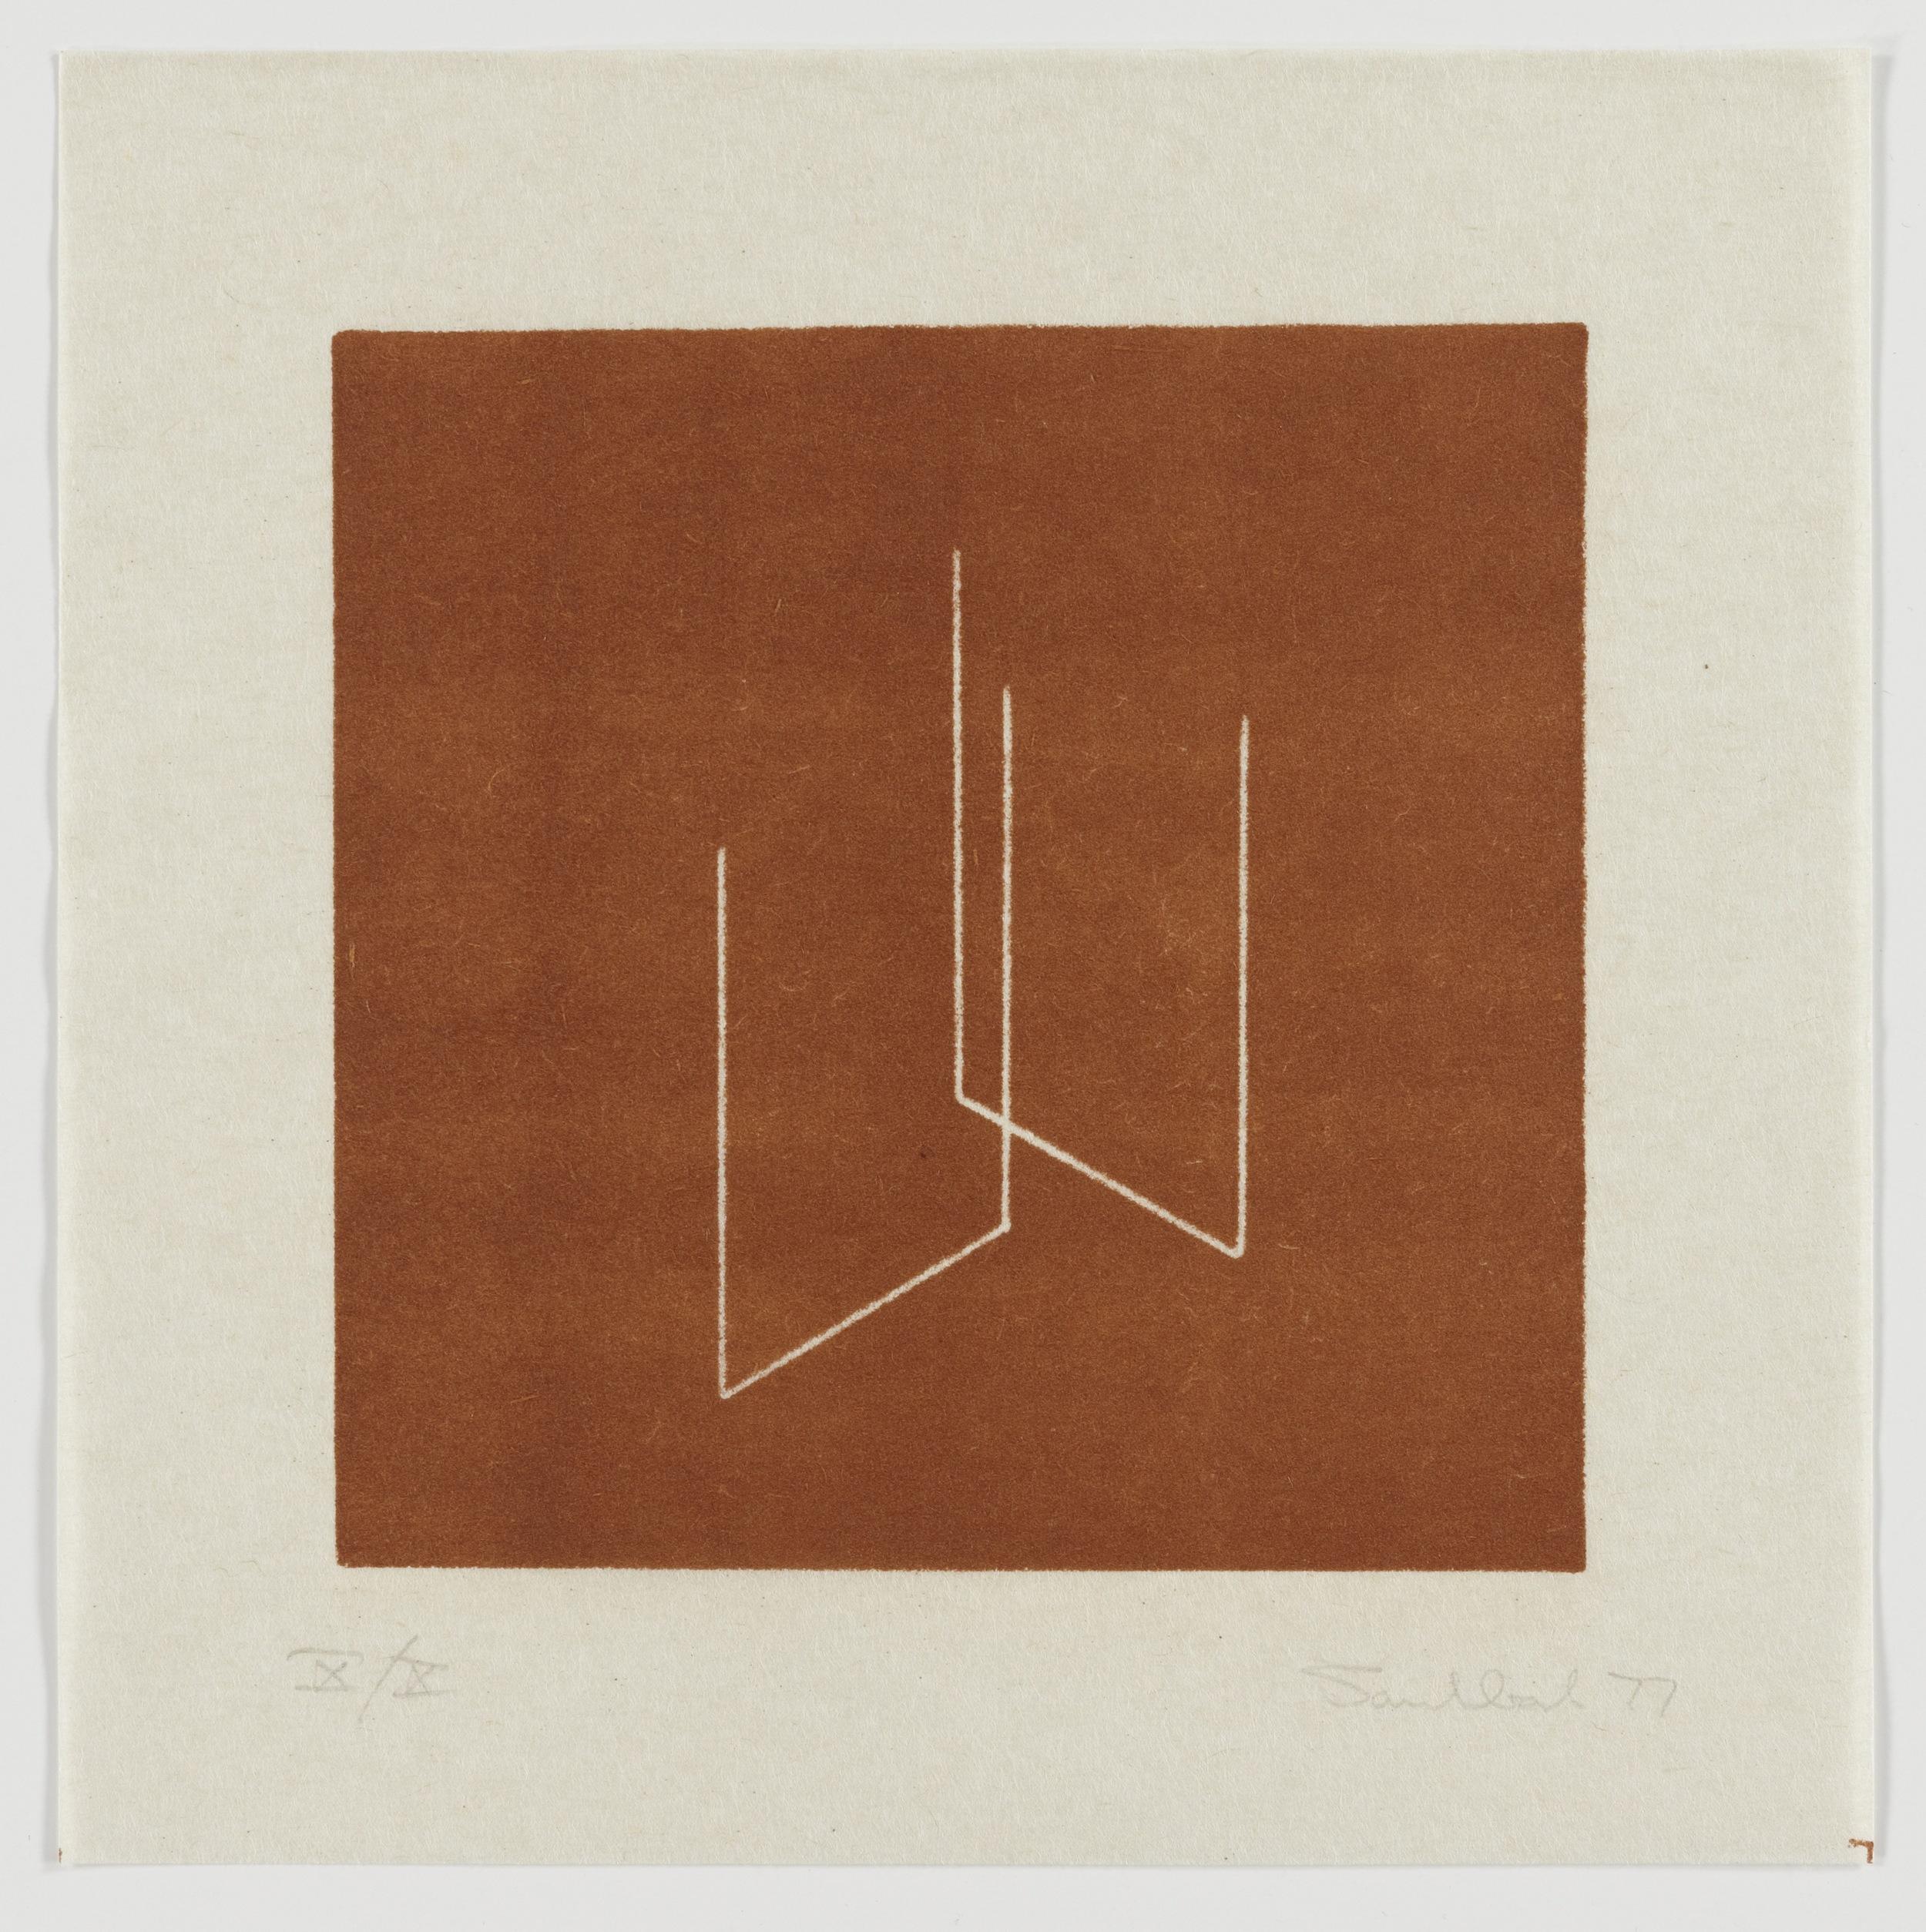 Fred Sandback, Untitled (from an untitled portfolio), 1977